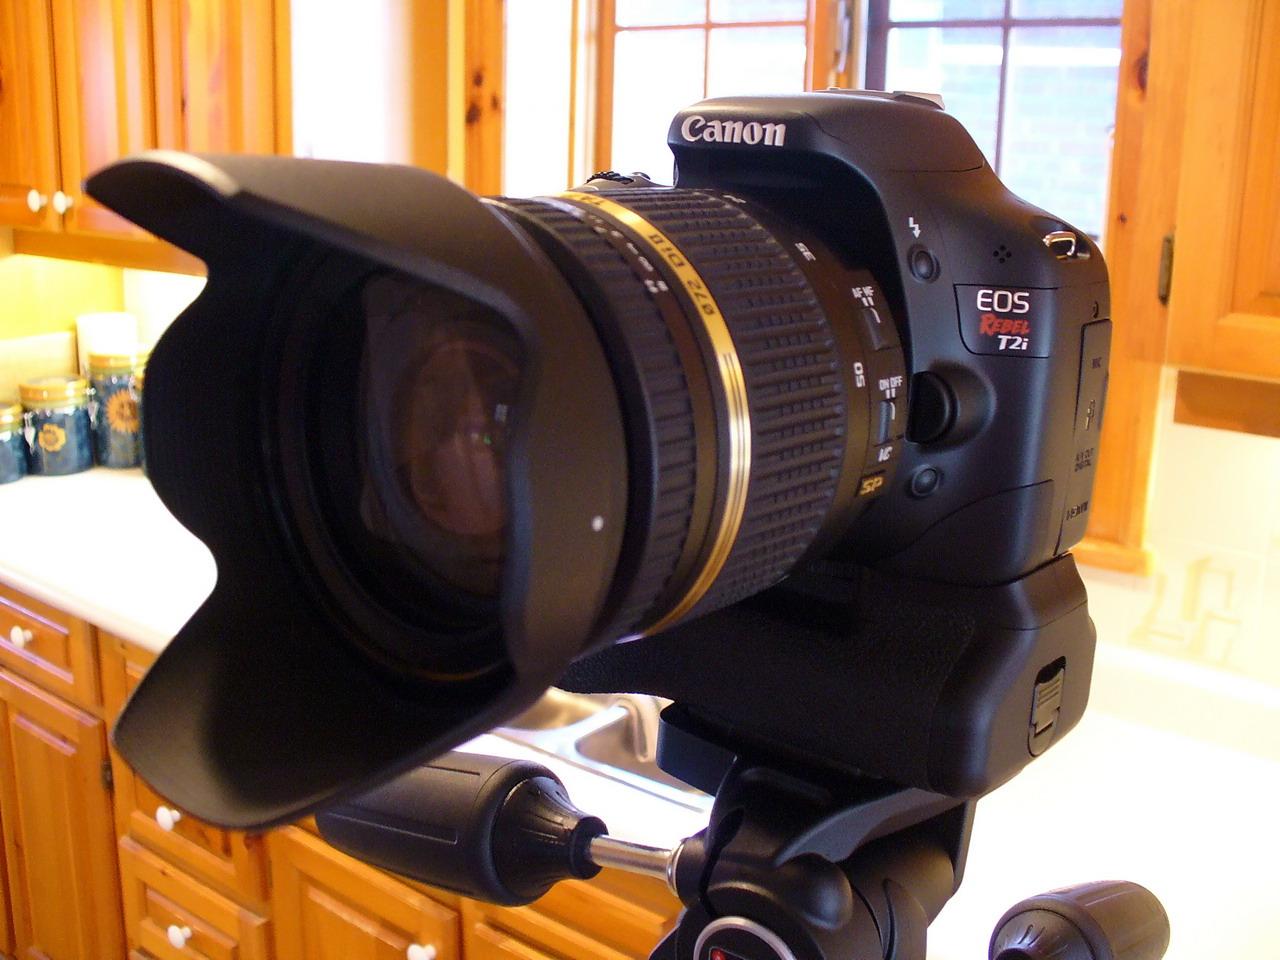 Canon t2i photography tips